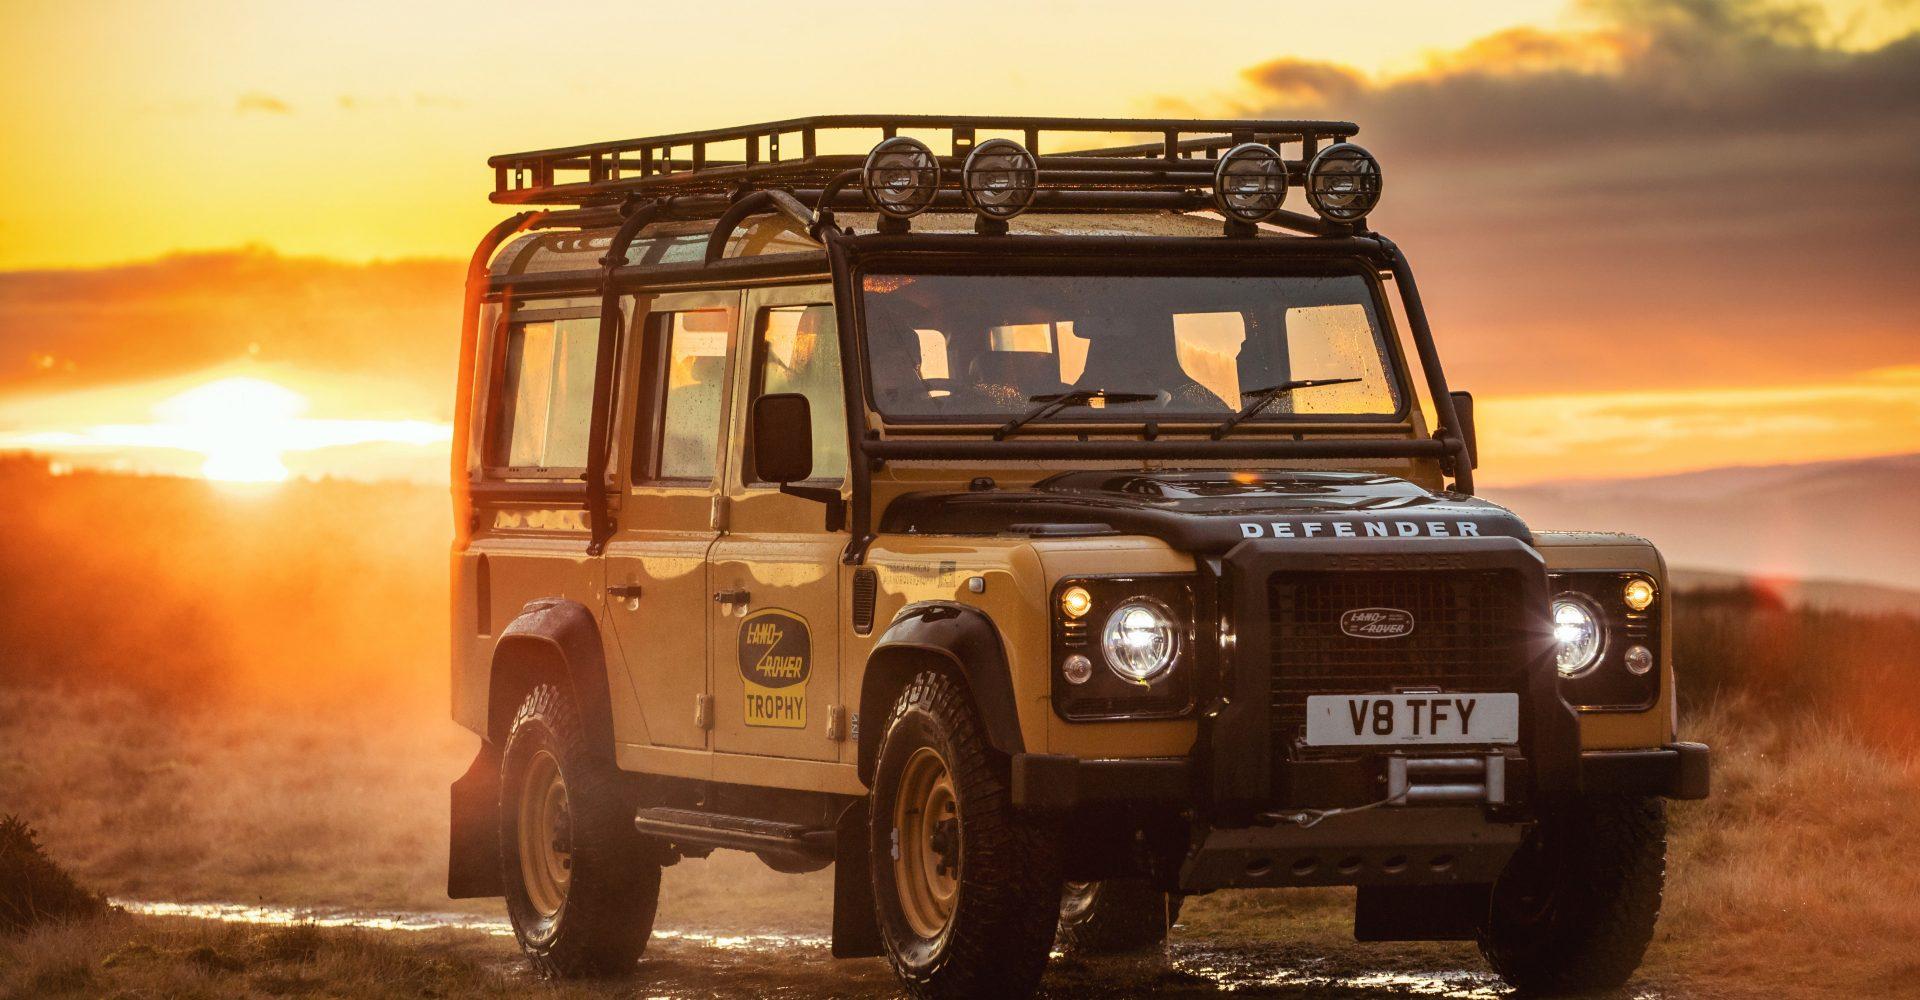 Land Rover Classic celebrates spirit of adventure with Defender Works V8 Trophy